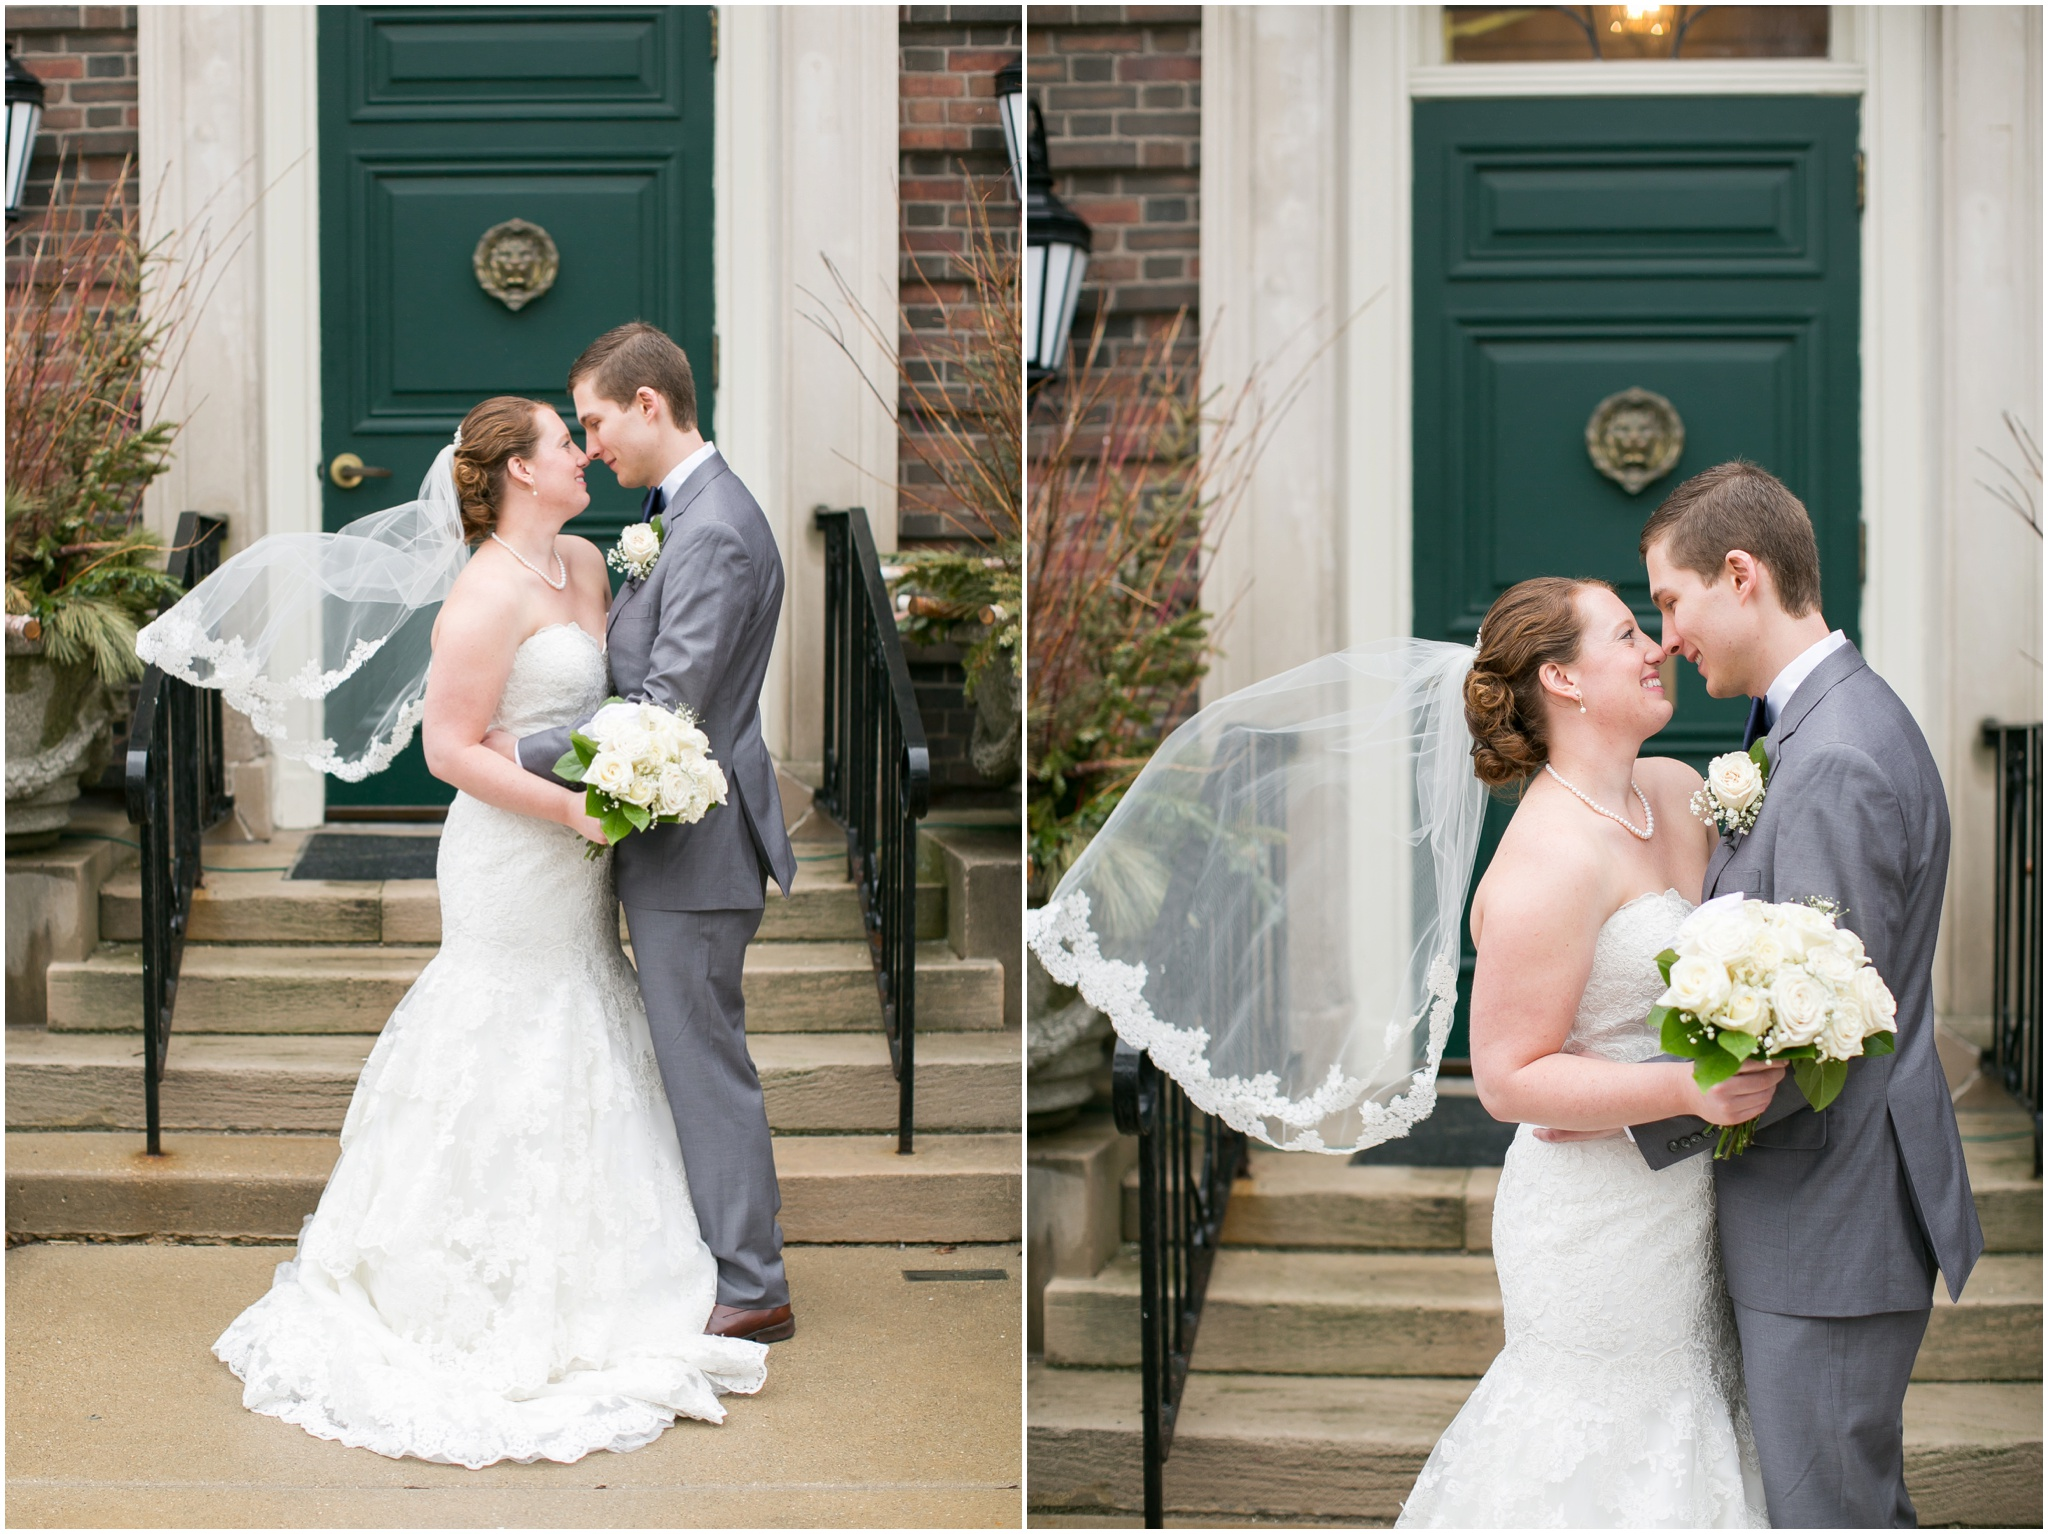 Madison_Club_Madison_Wisconsin_Wedding_Photographer_Spring_Rainy_Wedding_2631.jpg